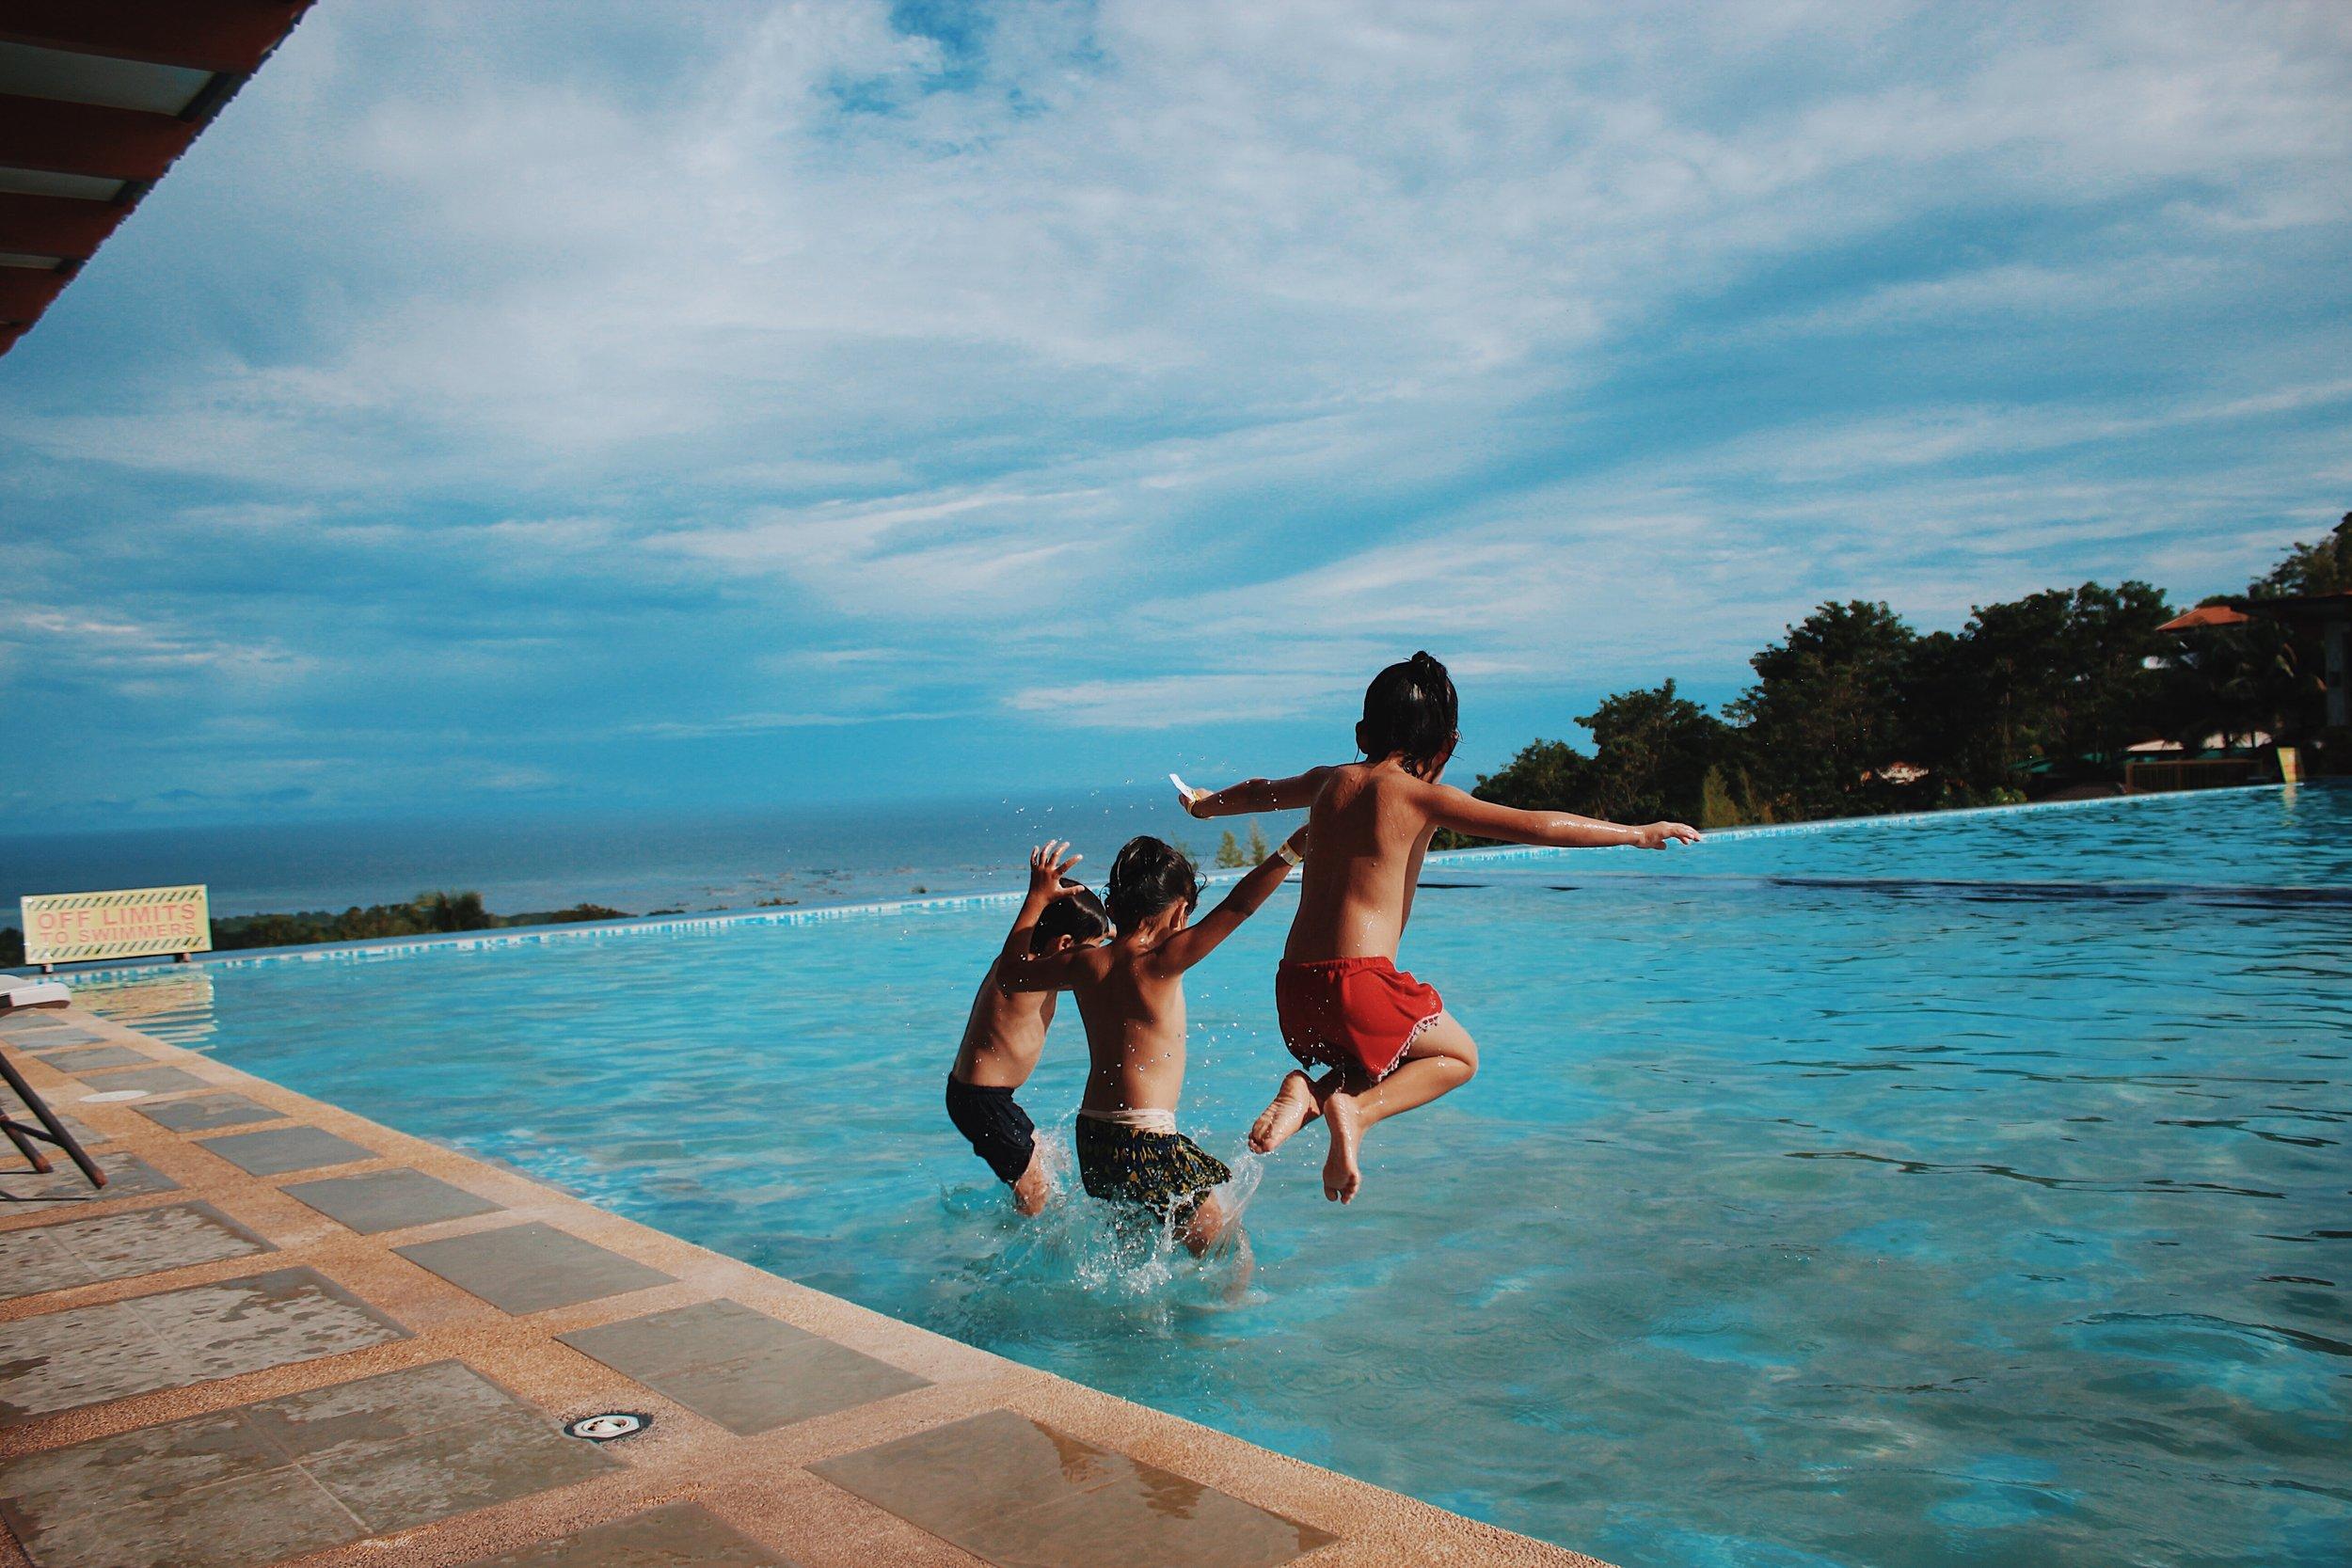 beach-children-enjoyment-870170.jpg